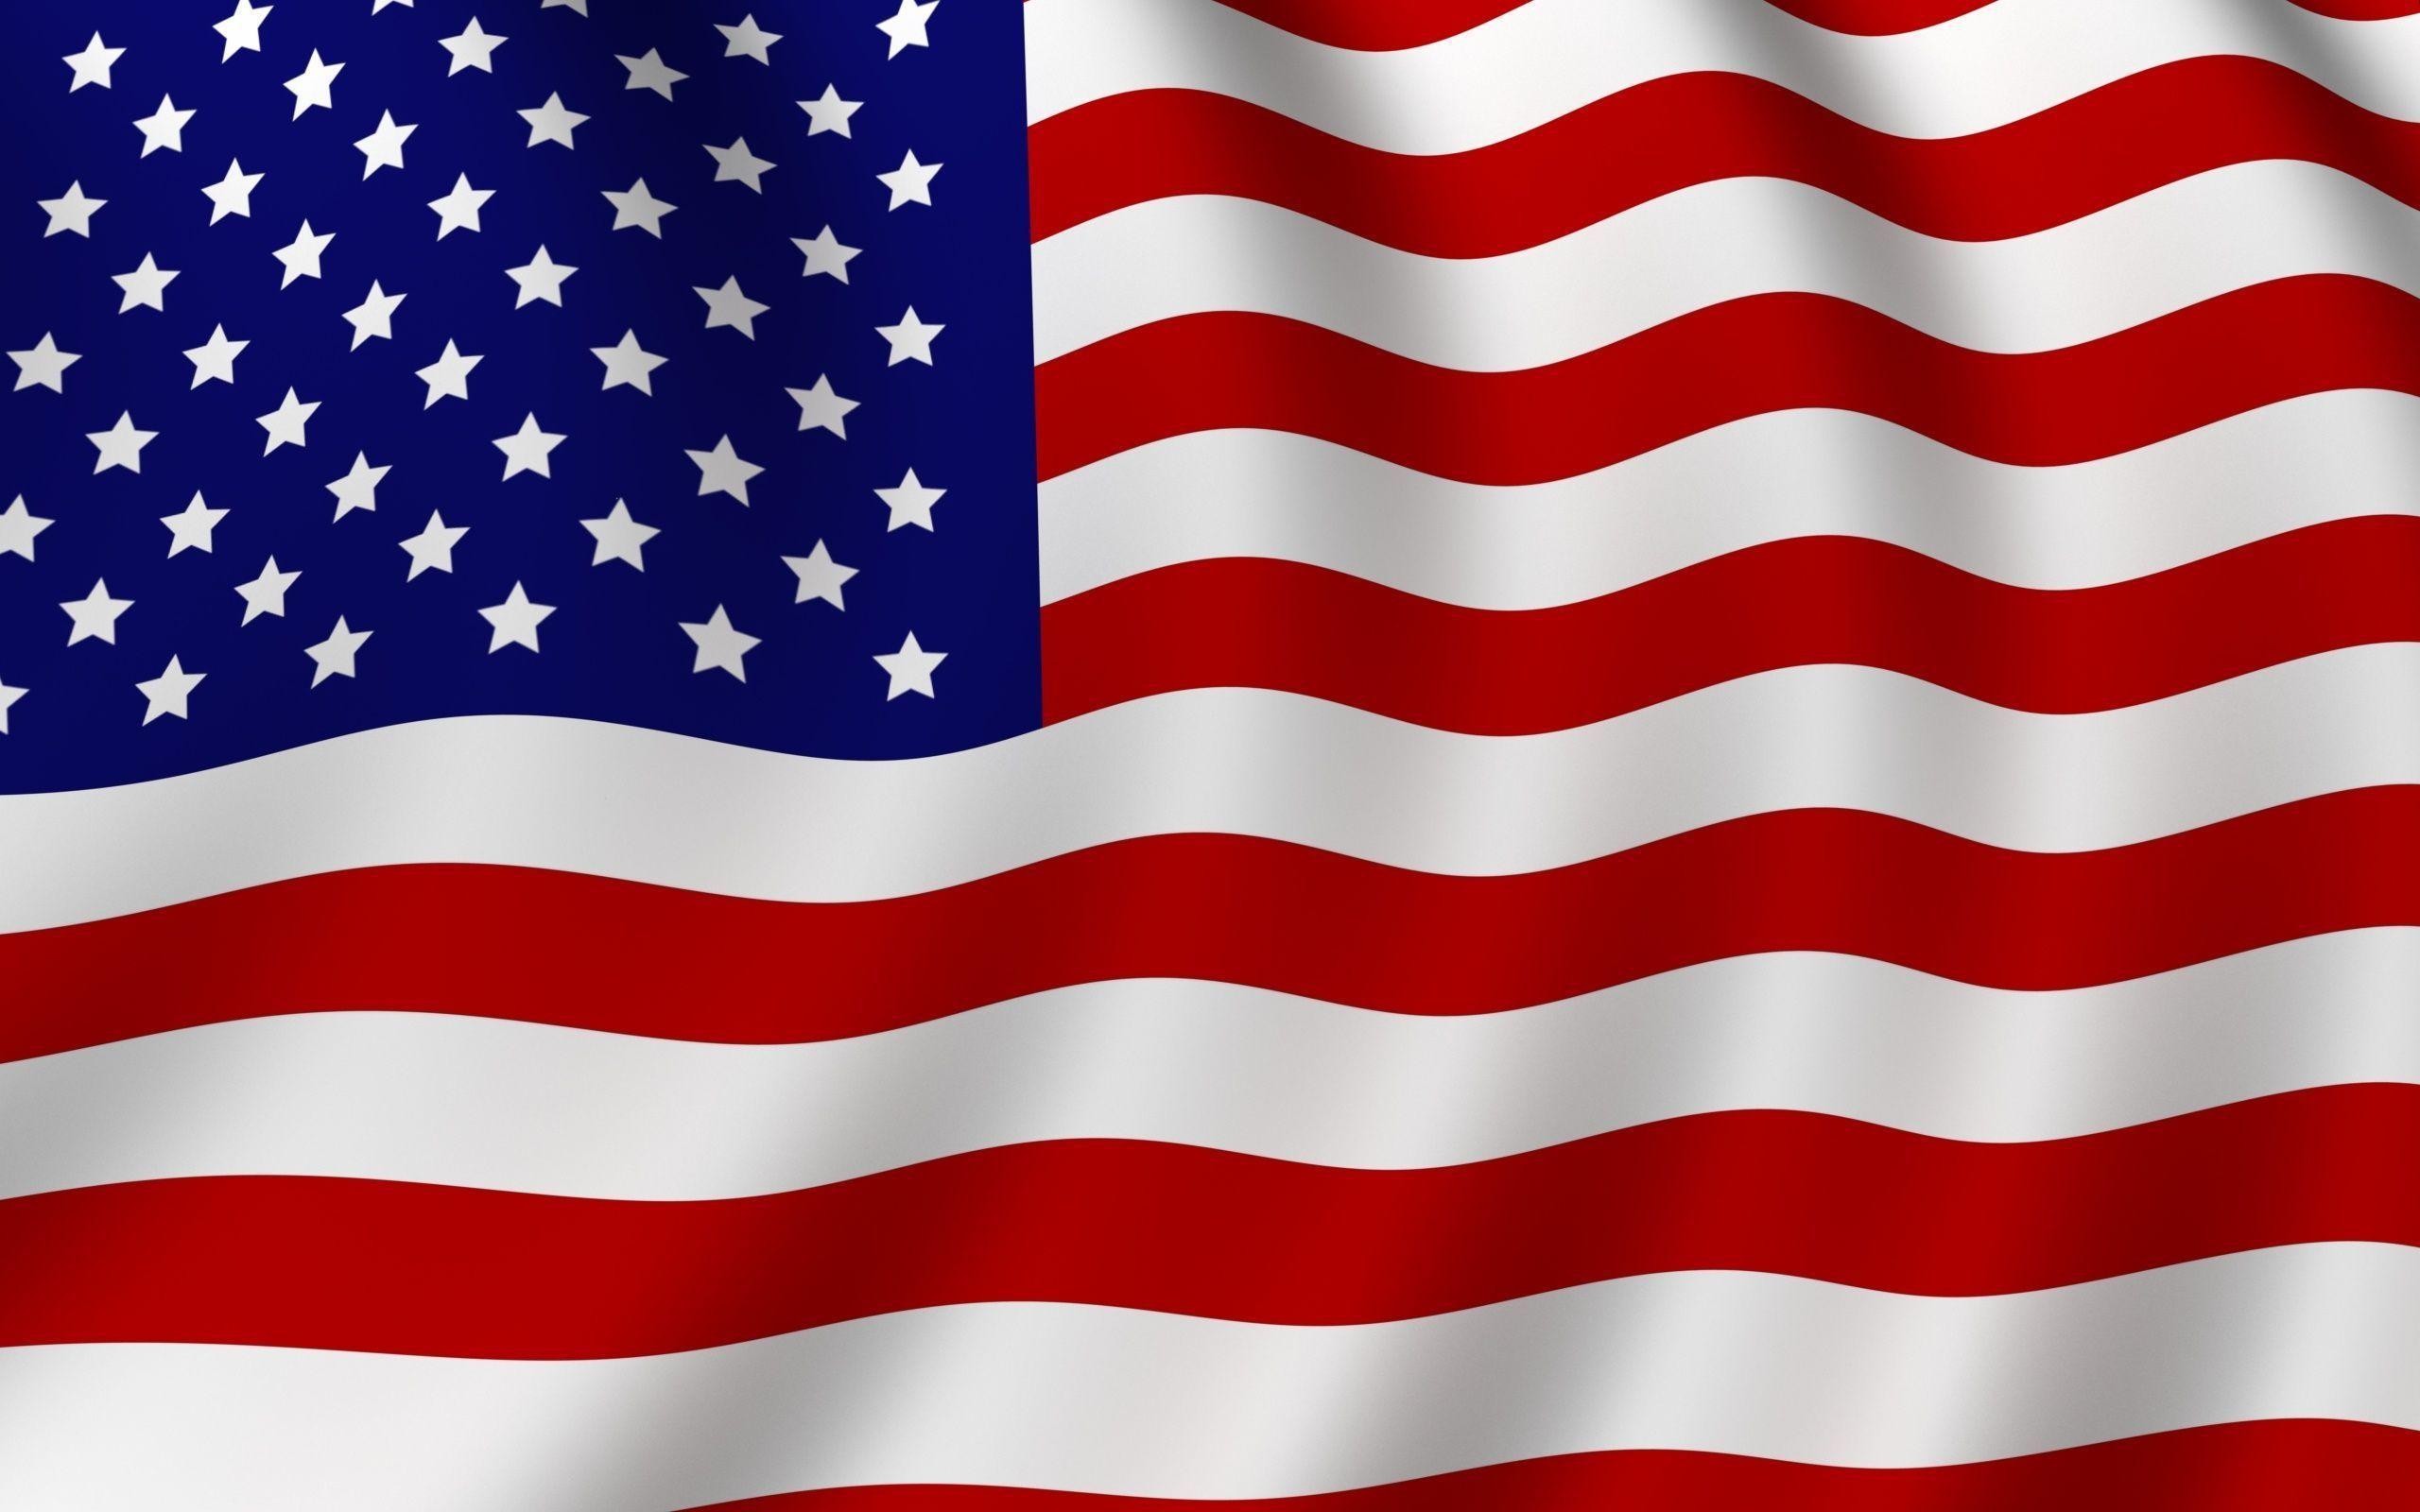 Best HD American Flag Wallpapers feelgrPH Американский